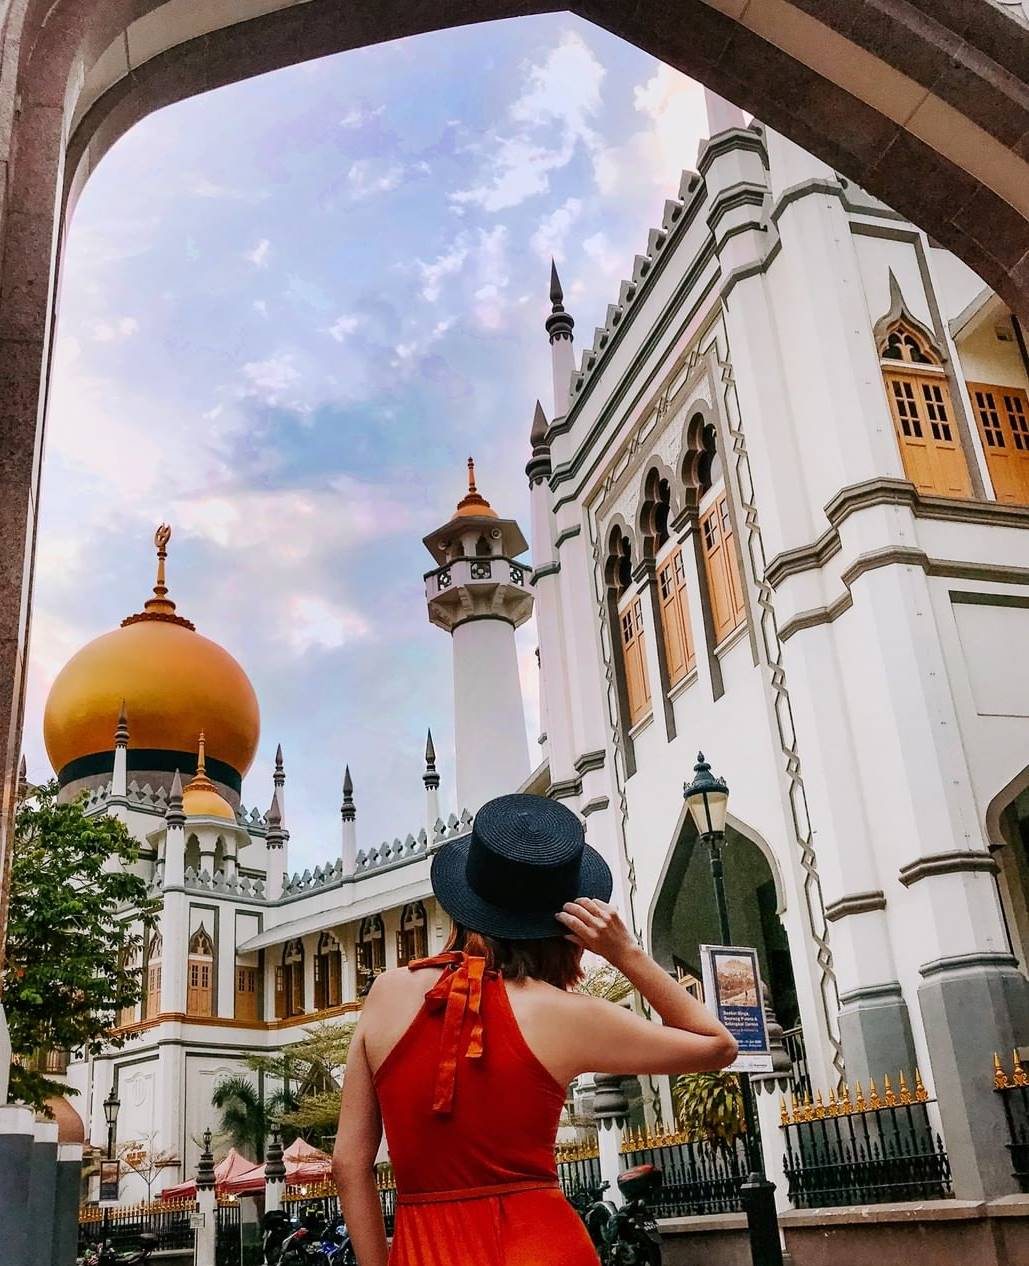 Tempat Sejarah di Singapura